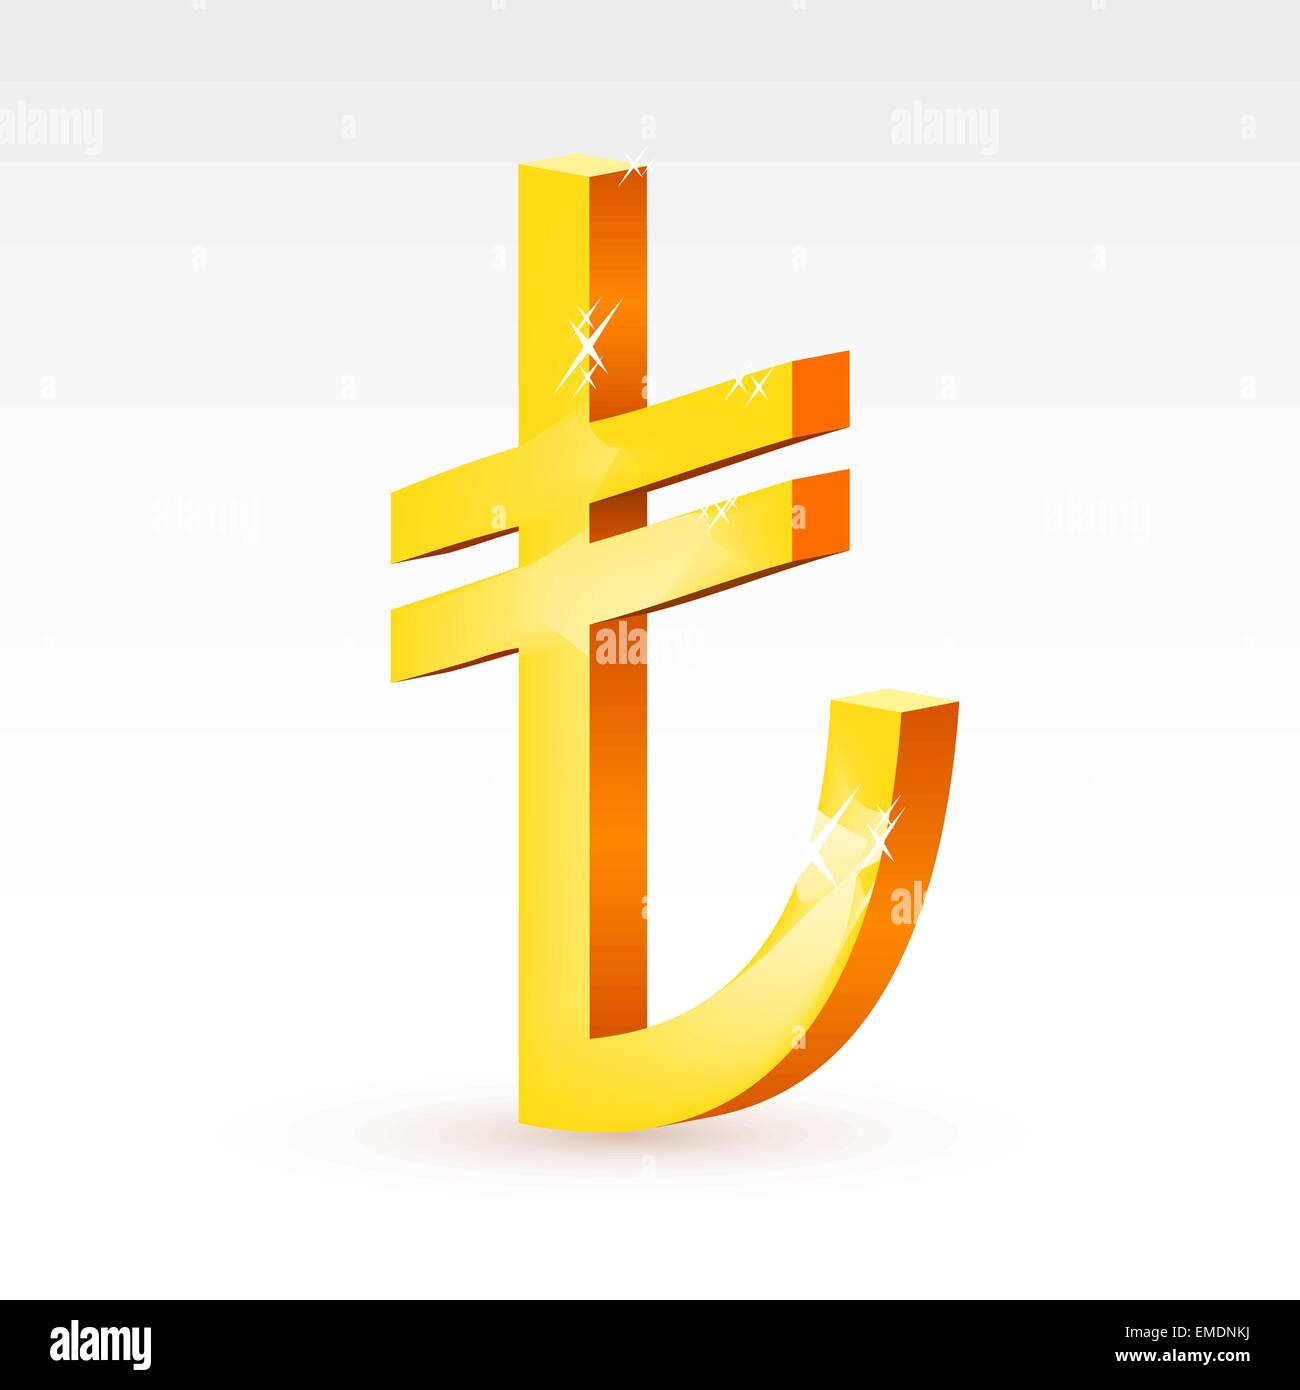 The currency sign of turkish lira stock vector art illustration the currency sign of turkish lira buycottarizona